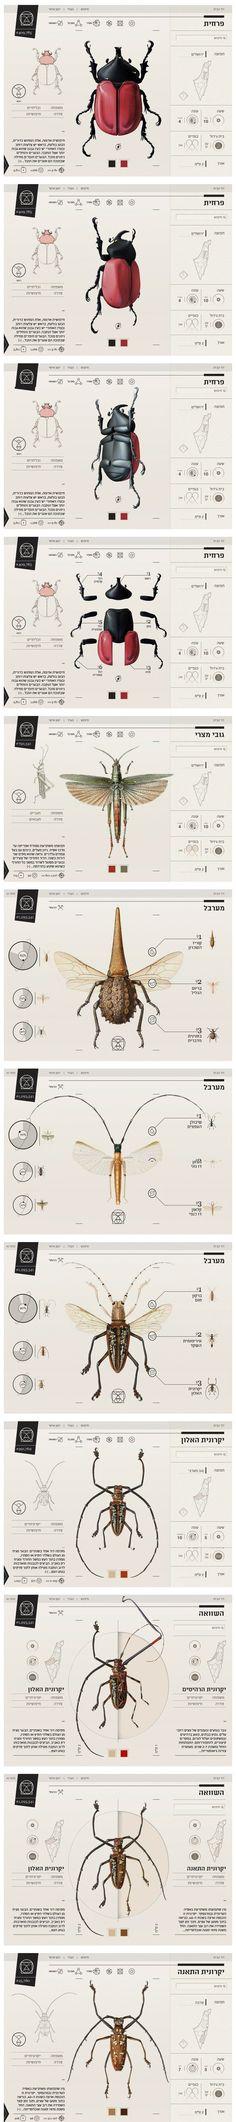 Insect Infographic   Designer: Johanna Rowe Calvi